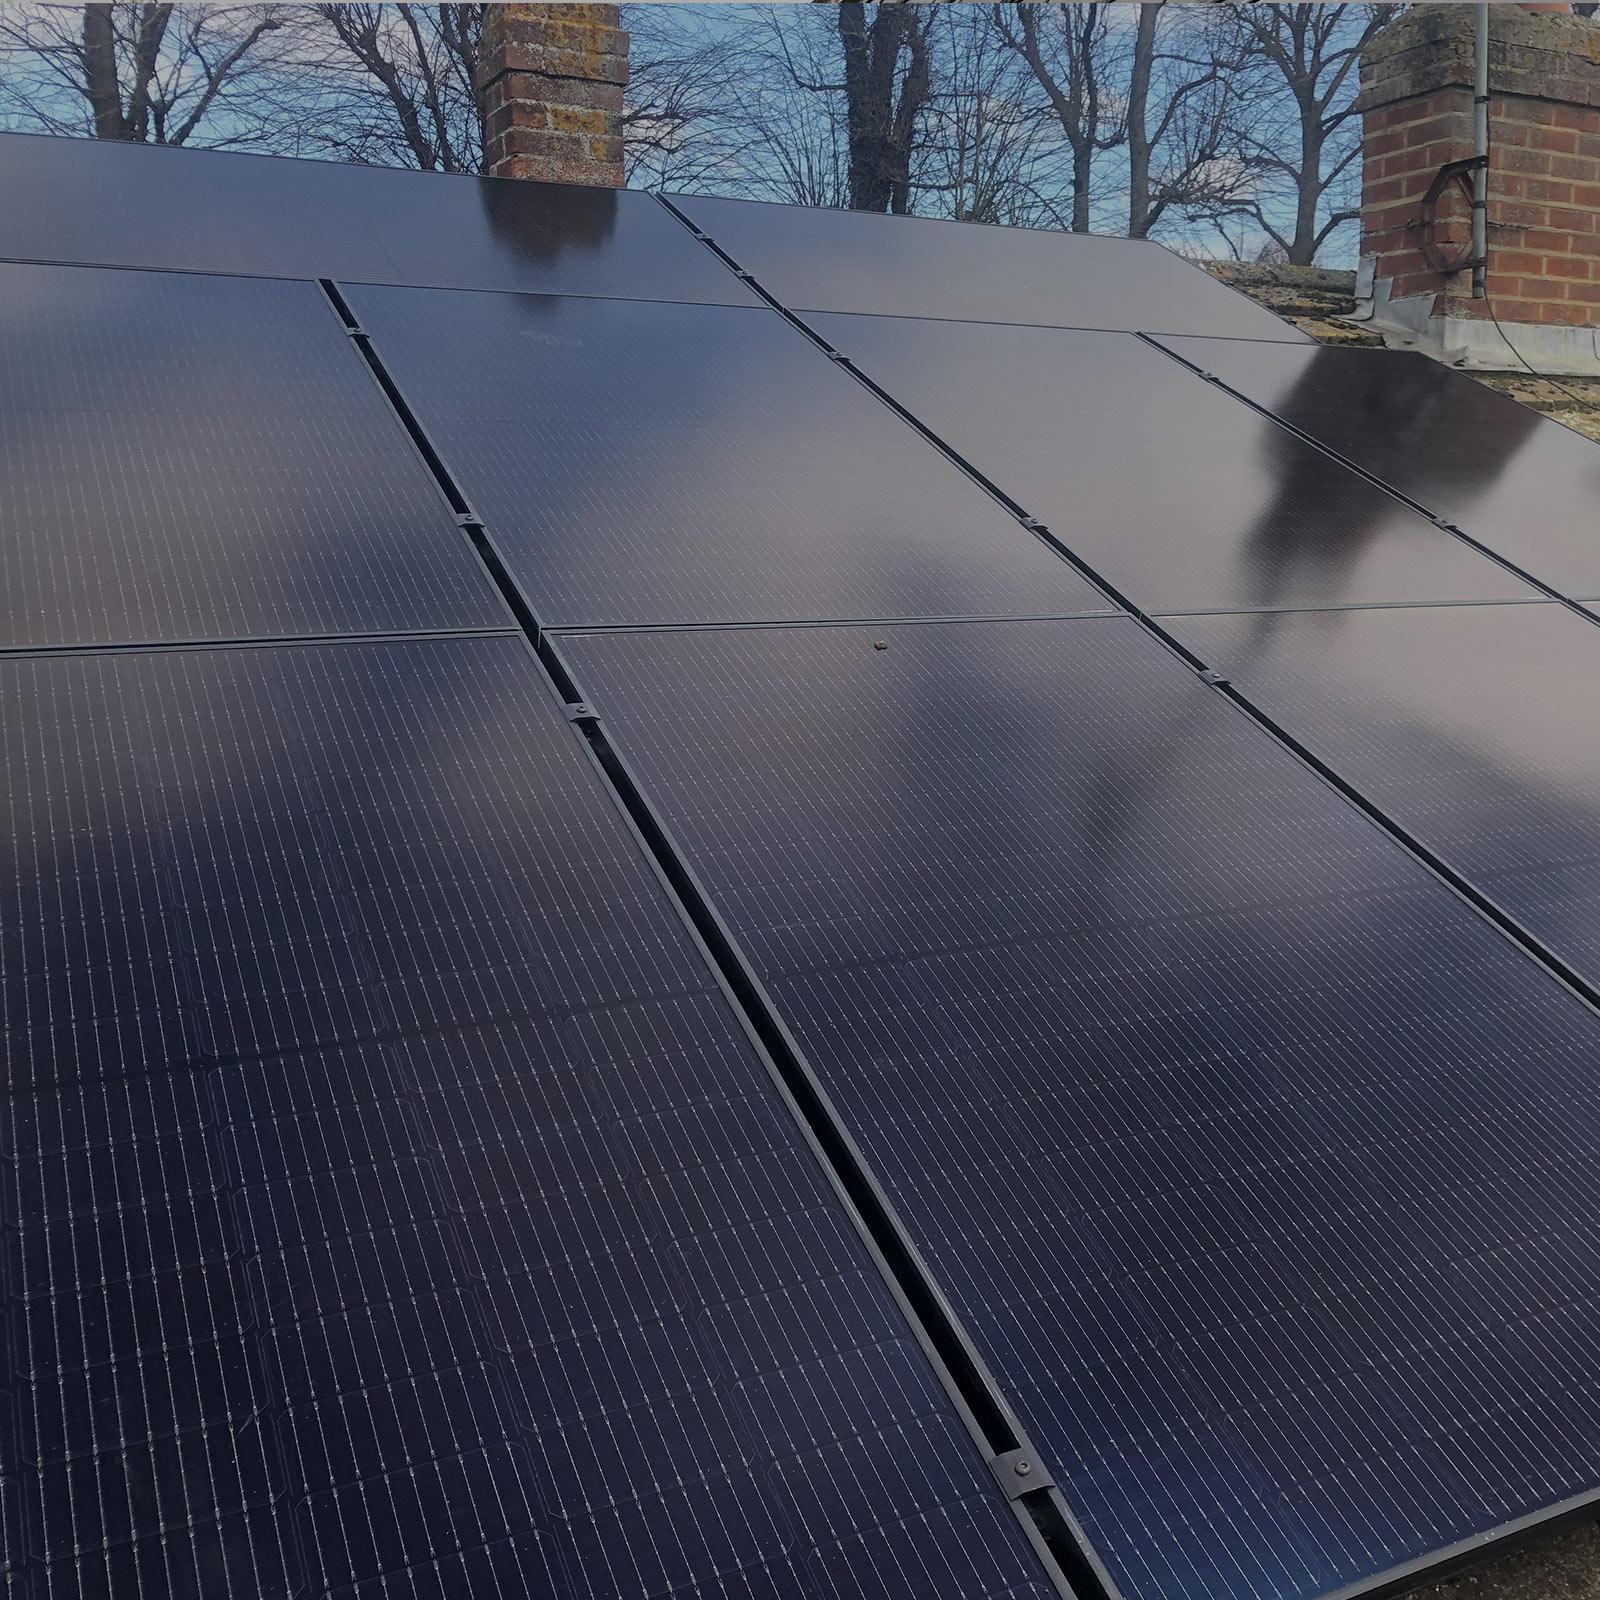 QCell Black Solar Panels